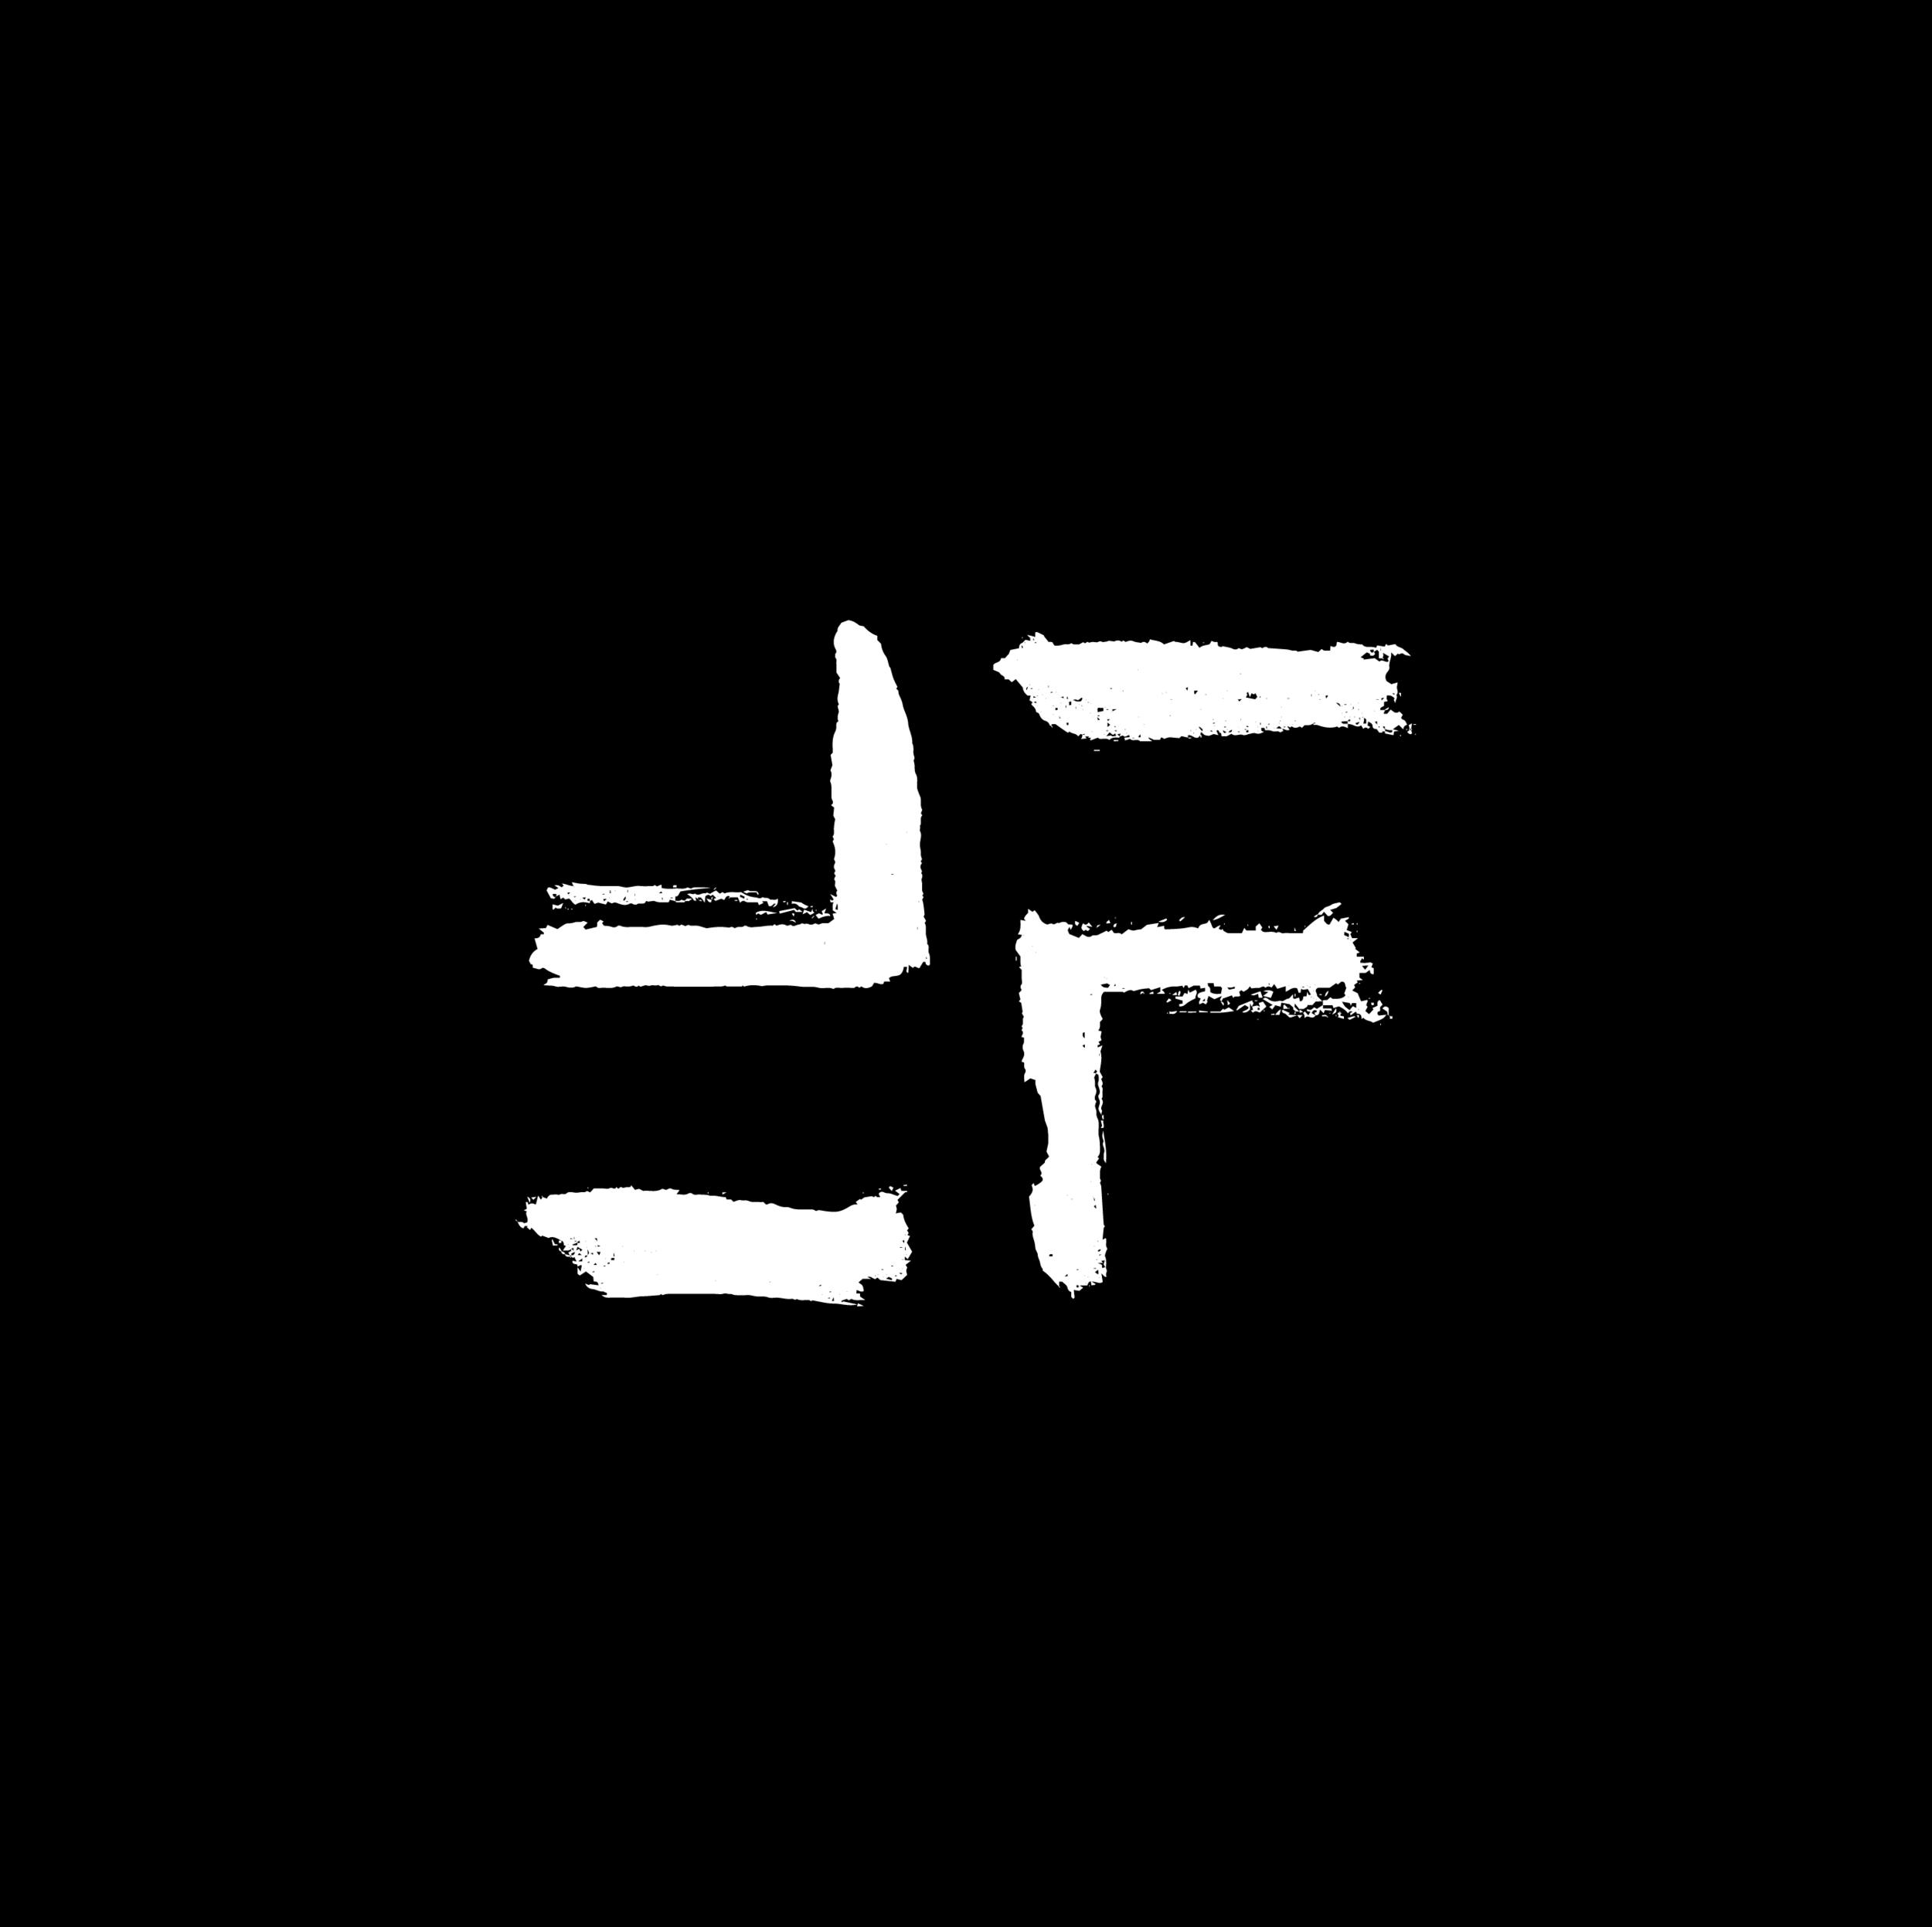 F2F-LOGO-SYMBOLE-01.png